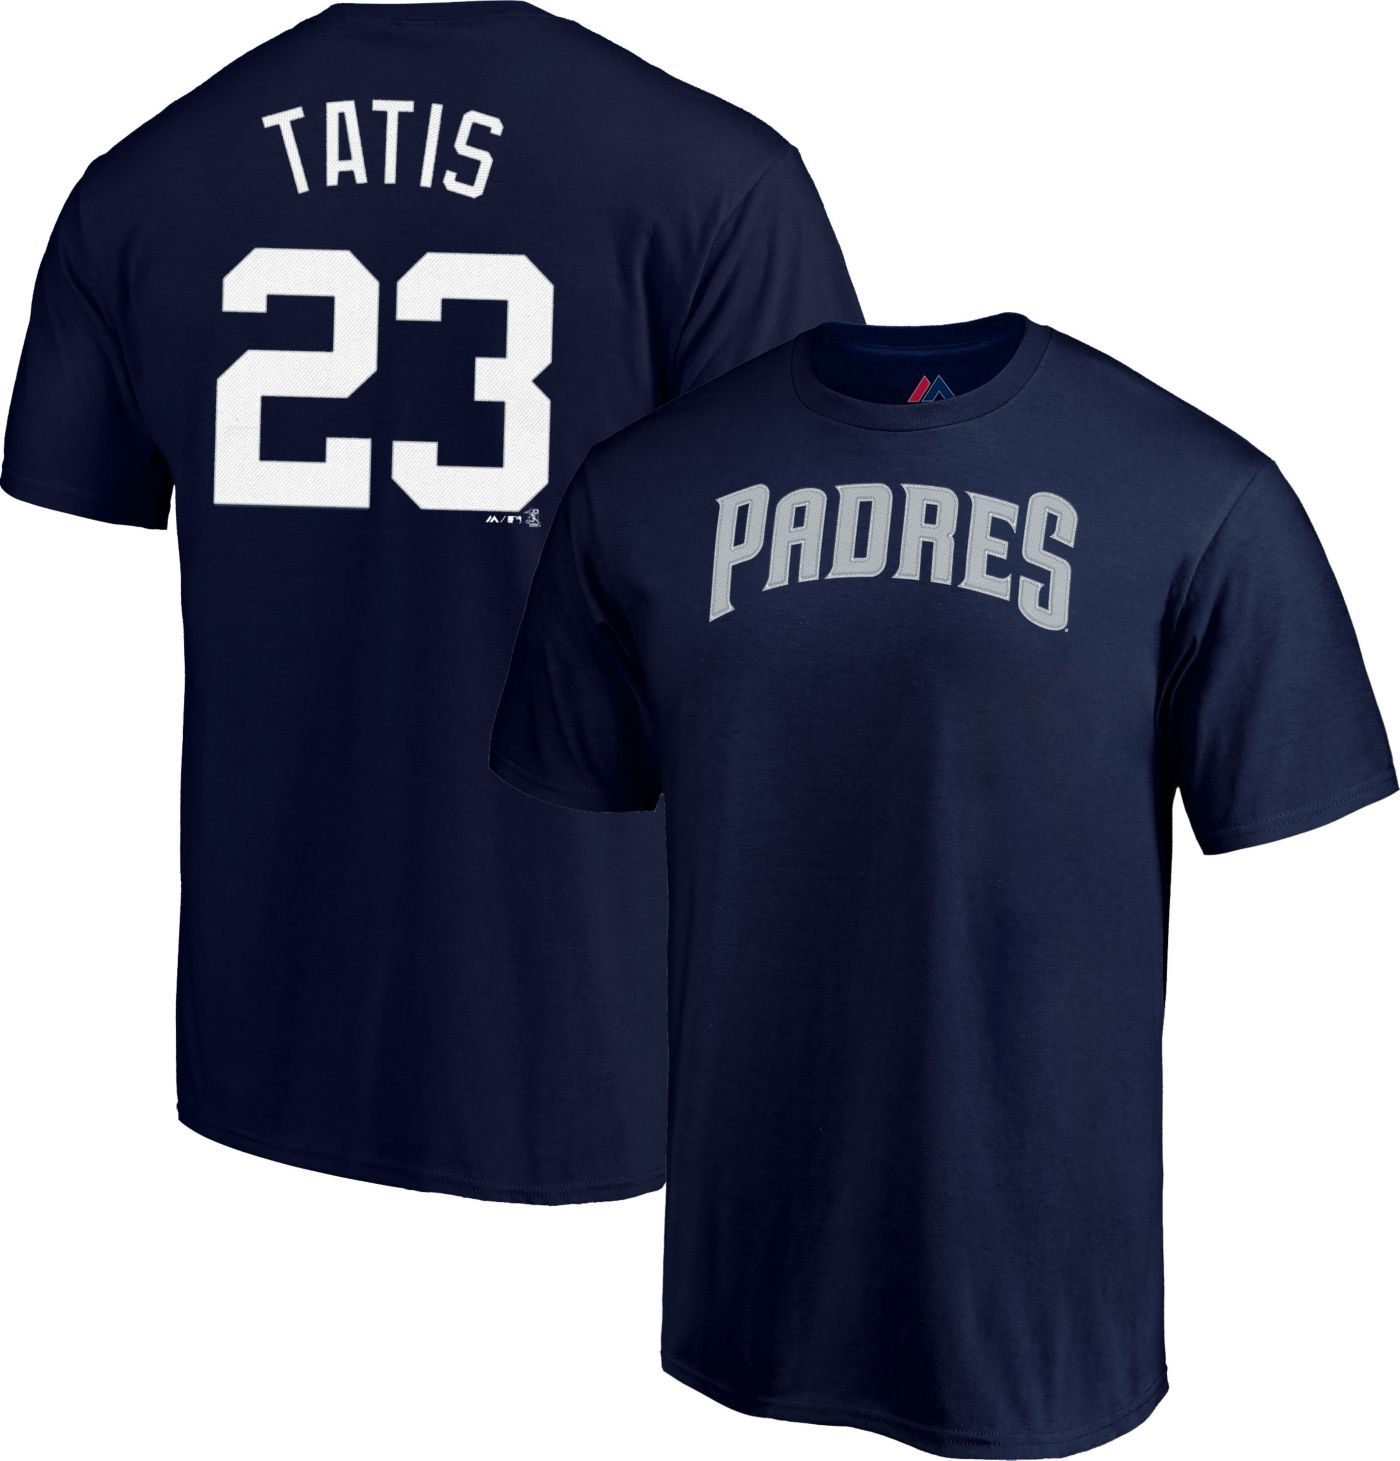 Majestic Men's San Diego Padres Fernando Tatis Jr. #23 Navy T-Shirt